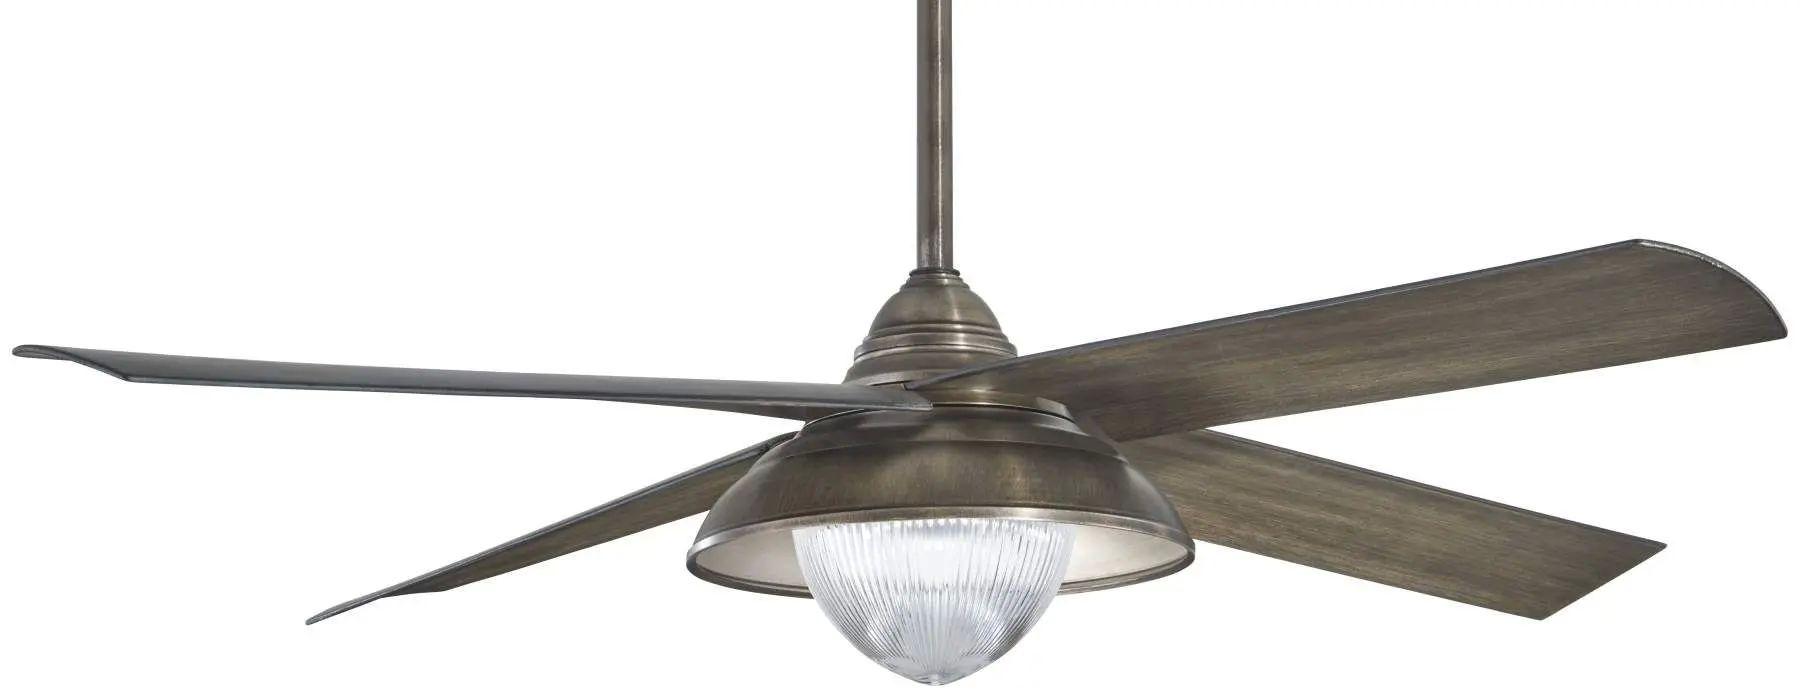 Minka Aire Shade LED Ceiling Fan In Heirloom Bronze